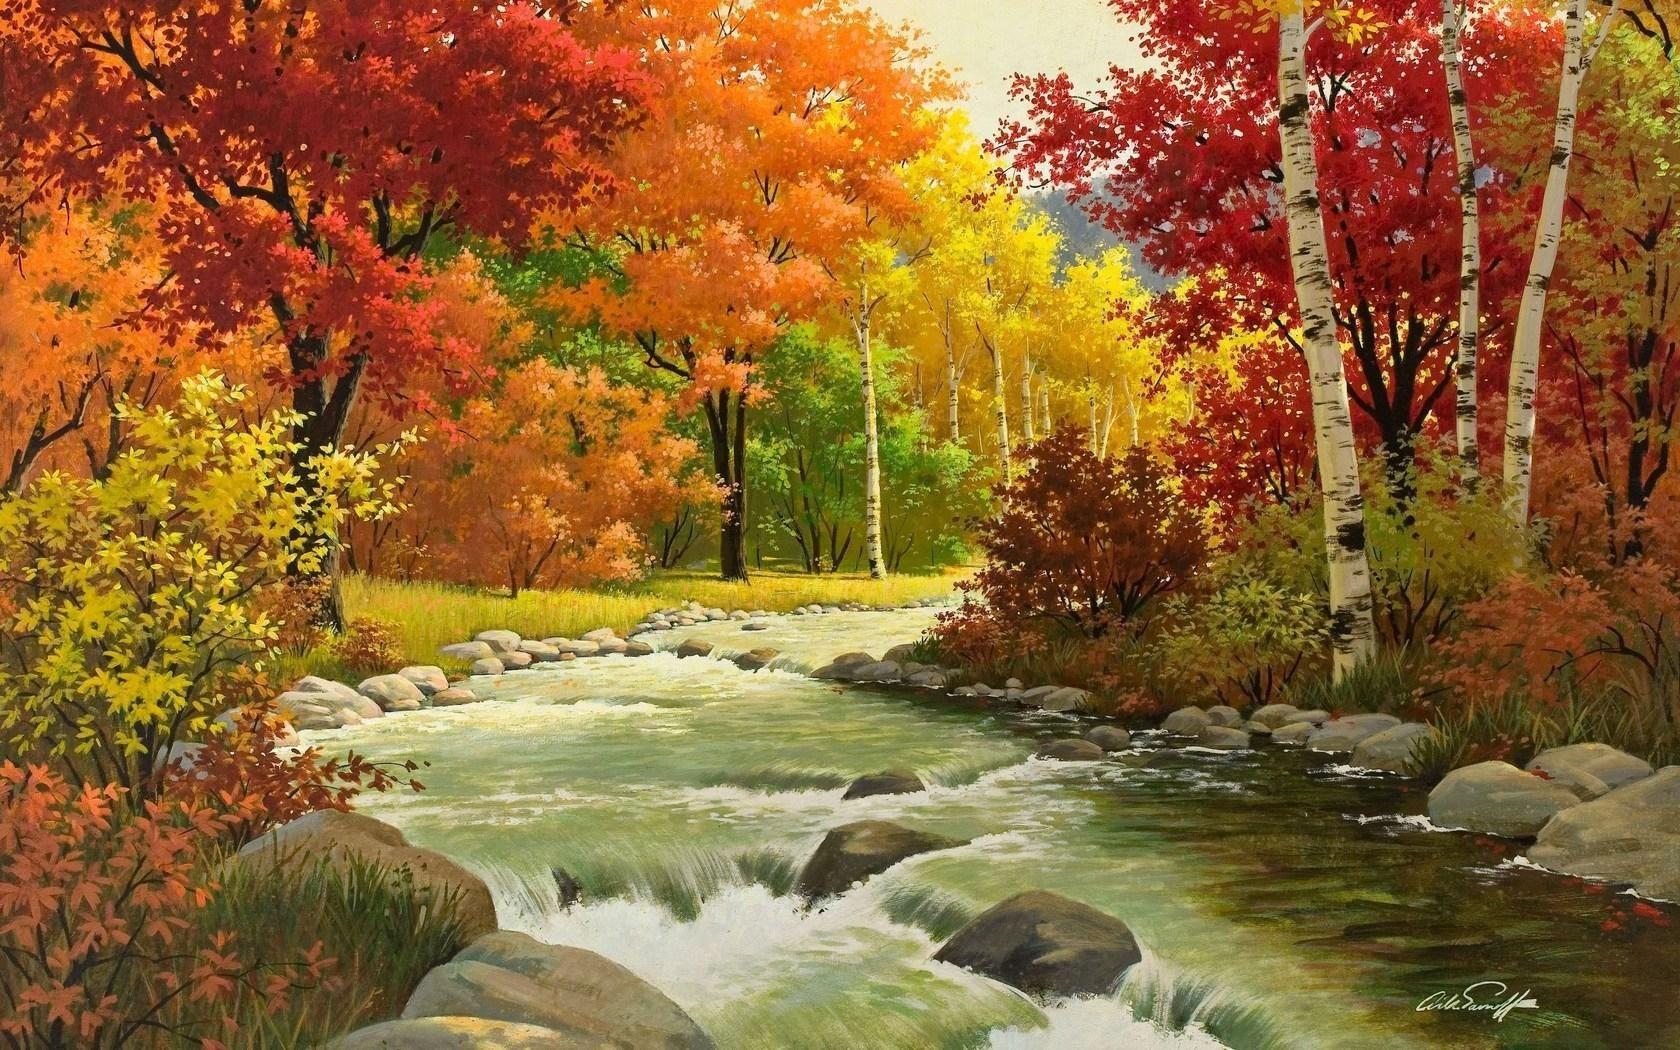 Wallpaper Musim Gugur Pemandangan Lukisan Sungai Kayu Hd Layar Lebar Definisi Tinggi Fullscreen Pemandangan Fotografi Alam Latar Belakang